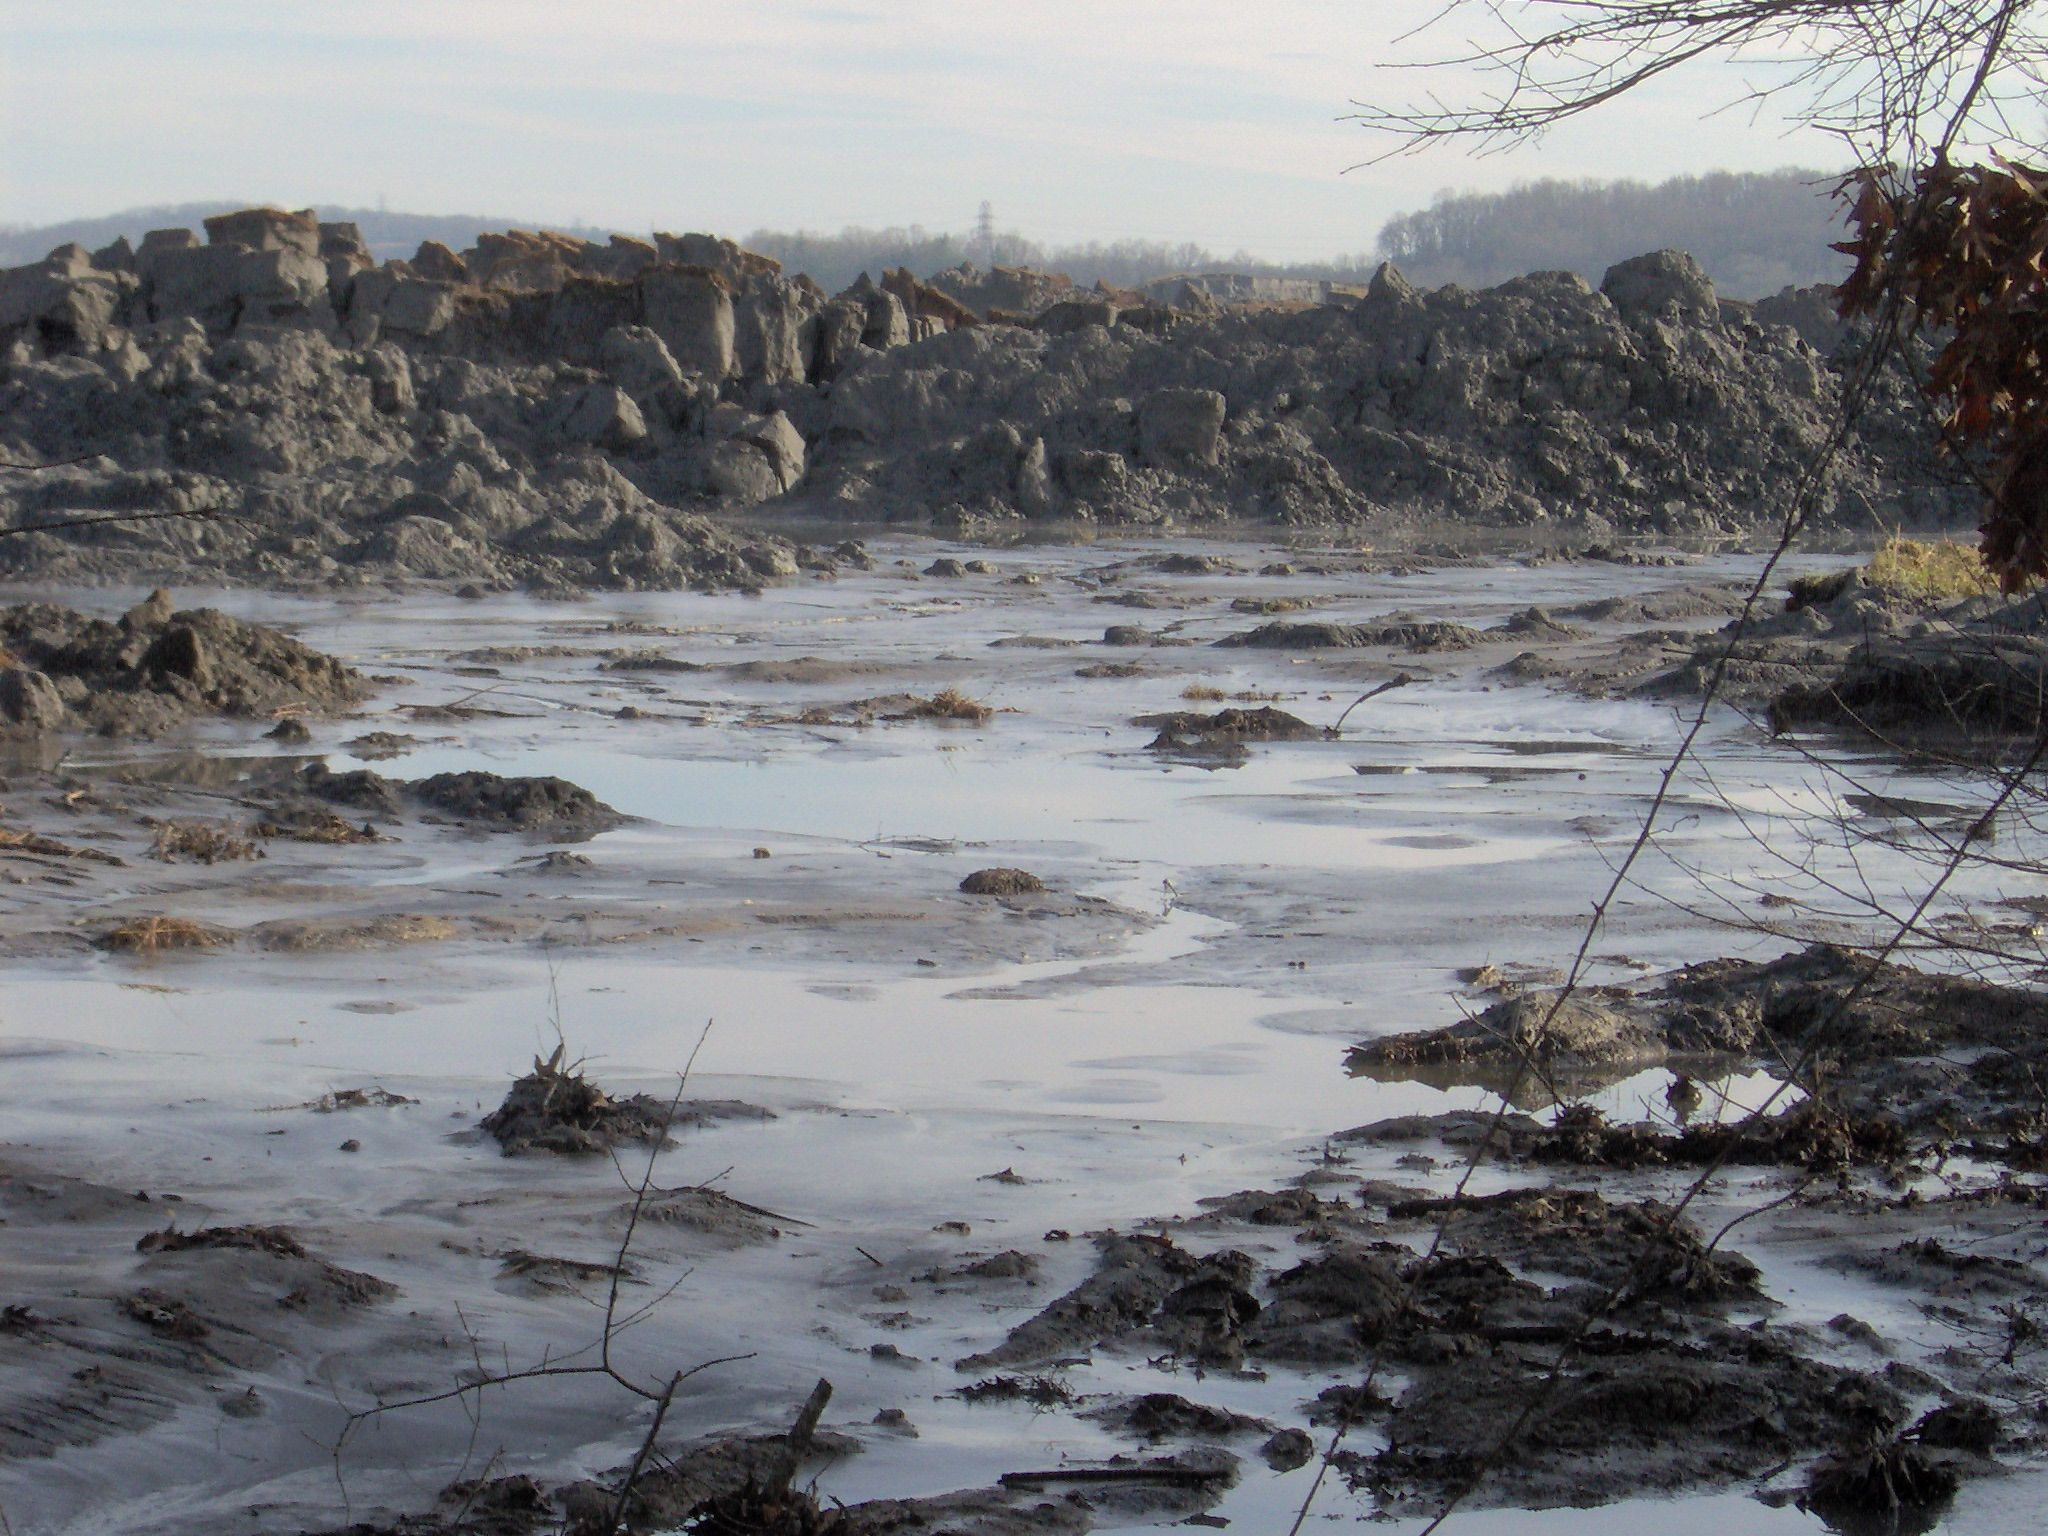 Kingston-plant-spill-swanpond-tn2